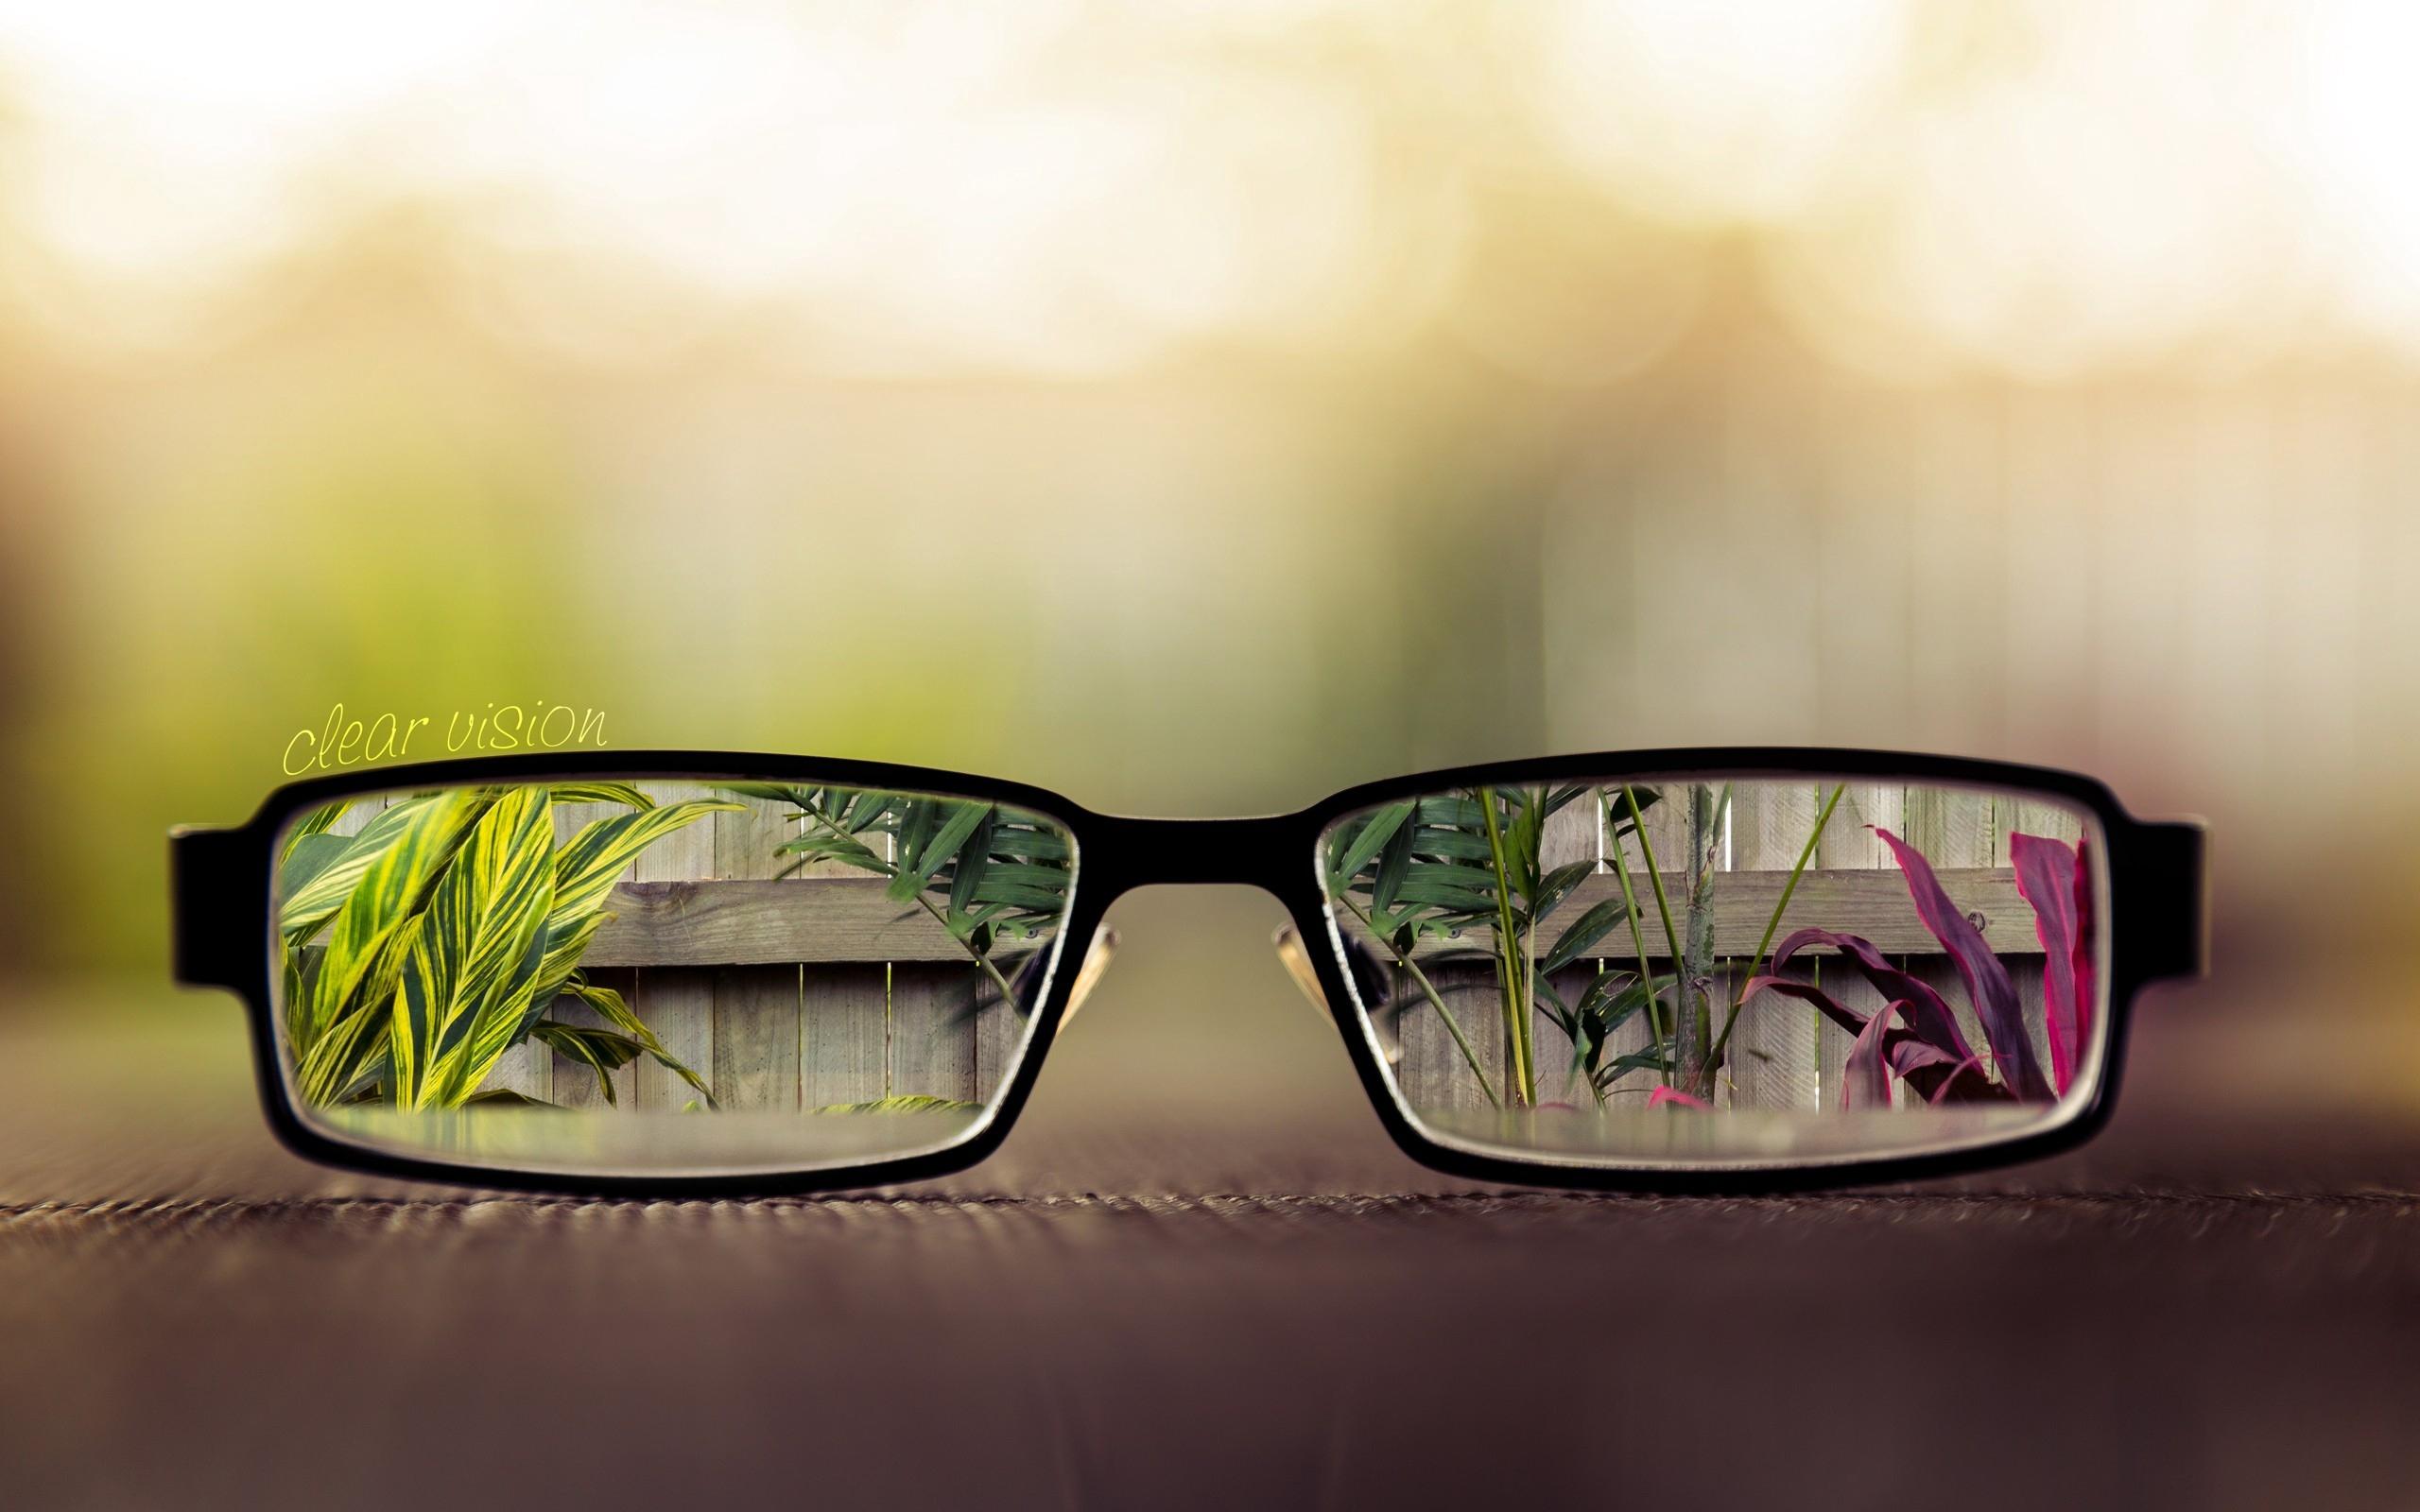 Optic 2